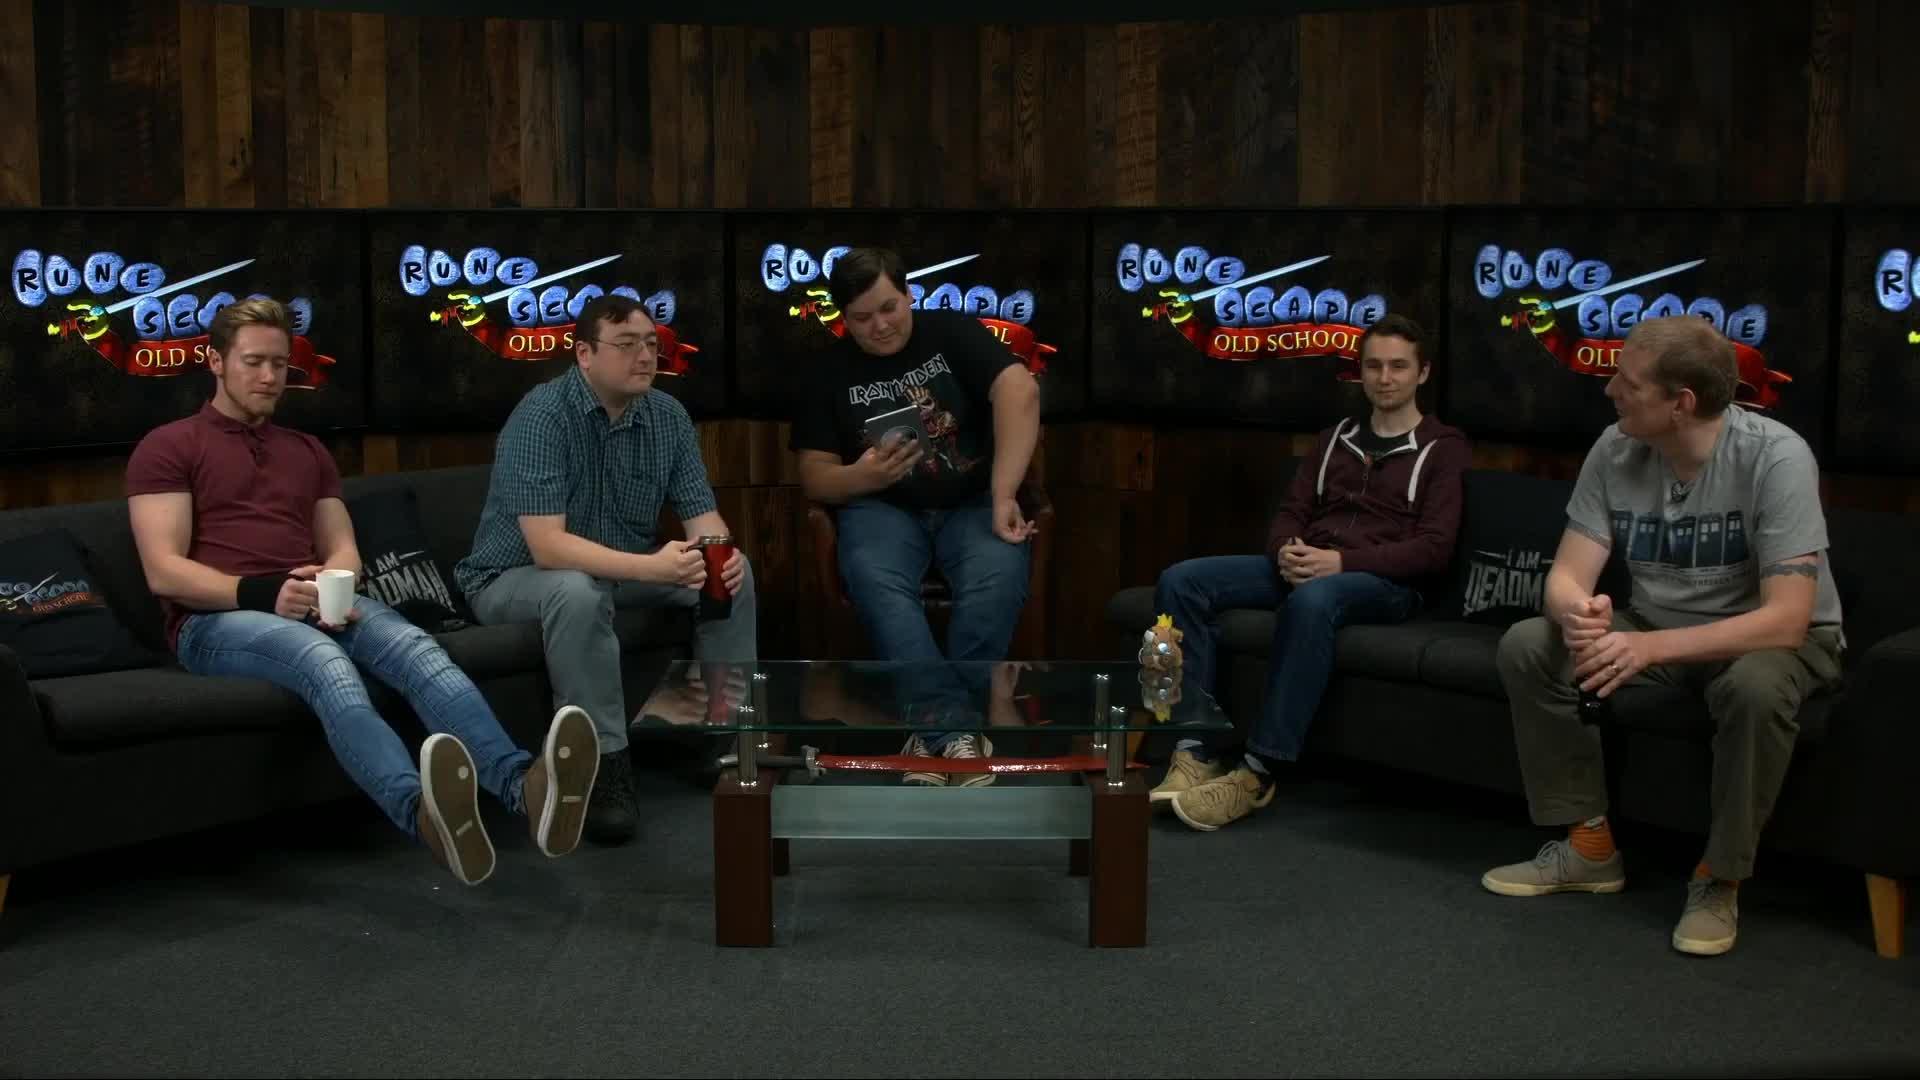 OSRS Mods speak up about MTX - Twitch